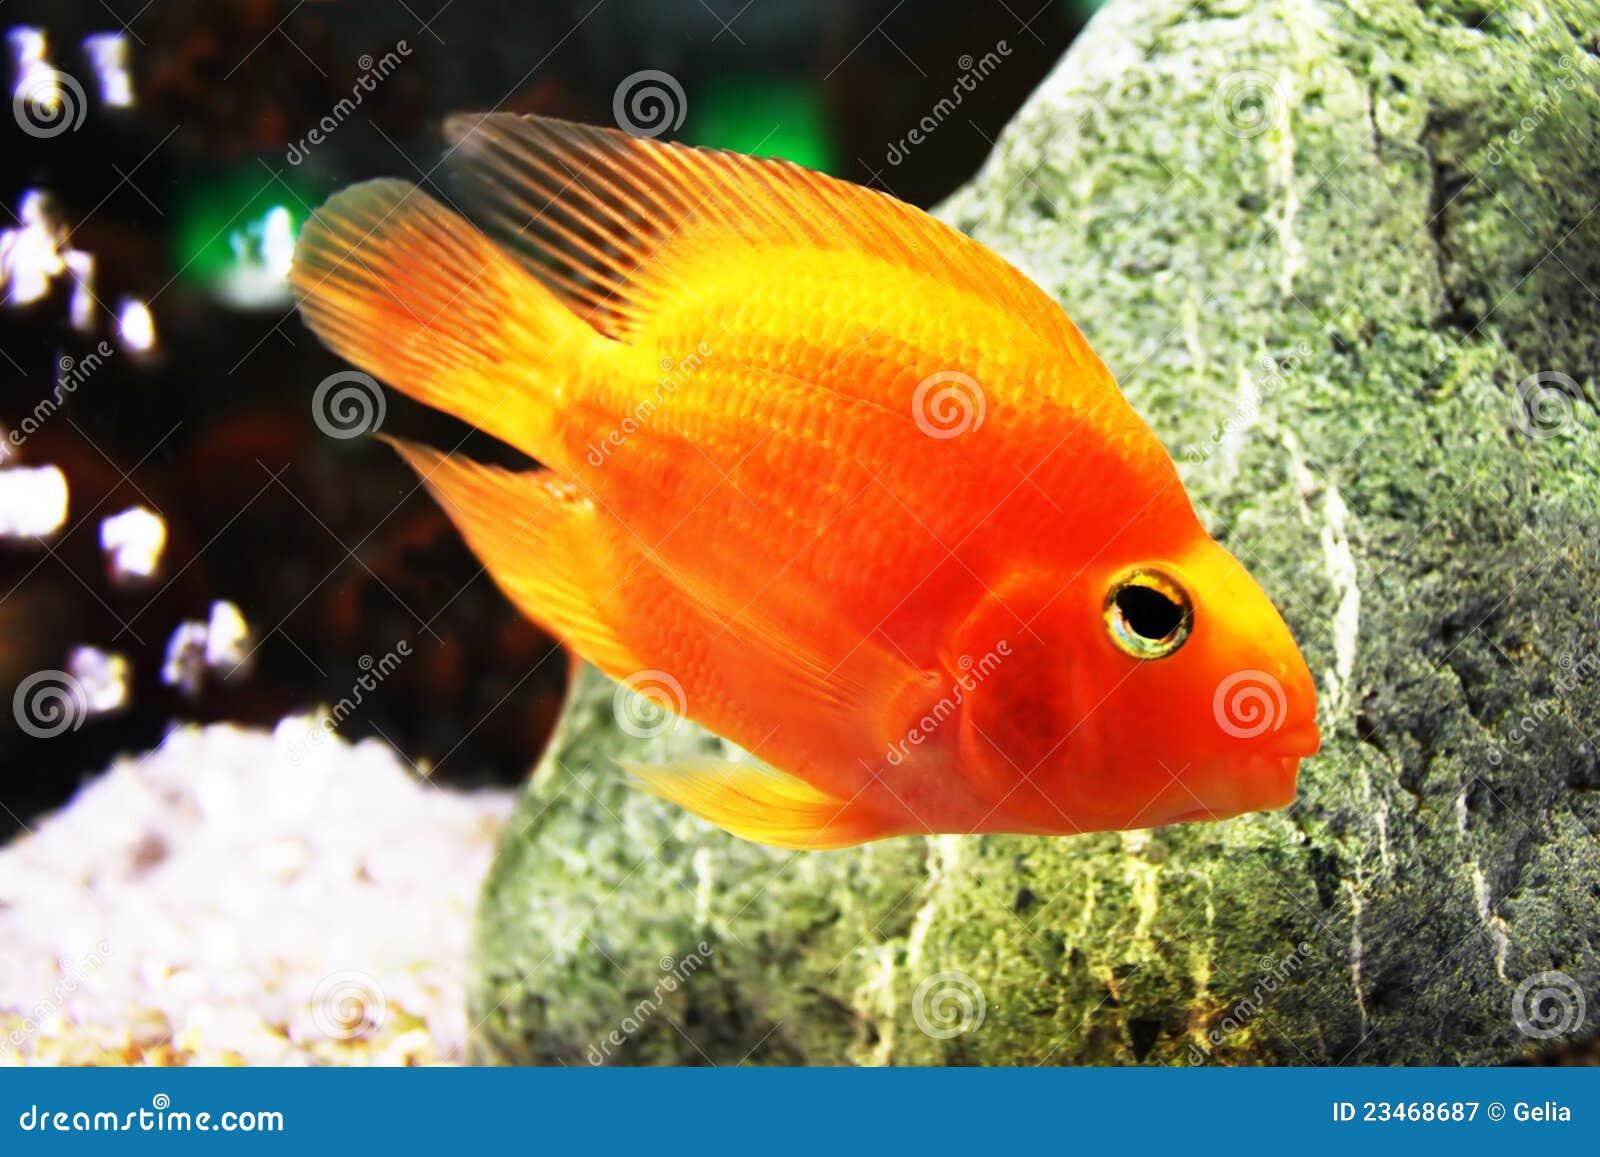 goldene fische im aquarium lizenzfreie stockfotografie. Black Bedroom Furniture Sets. Home Design Ideas